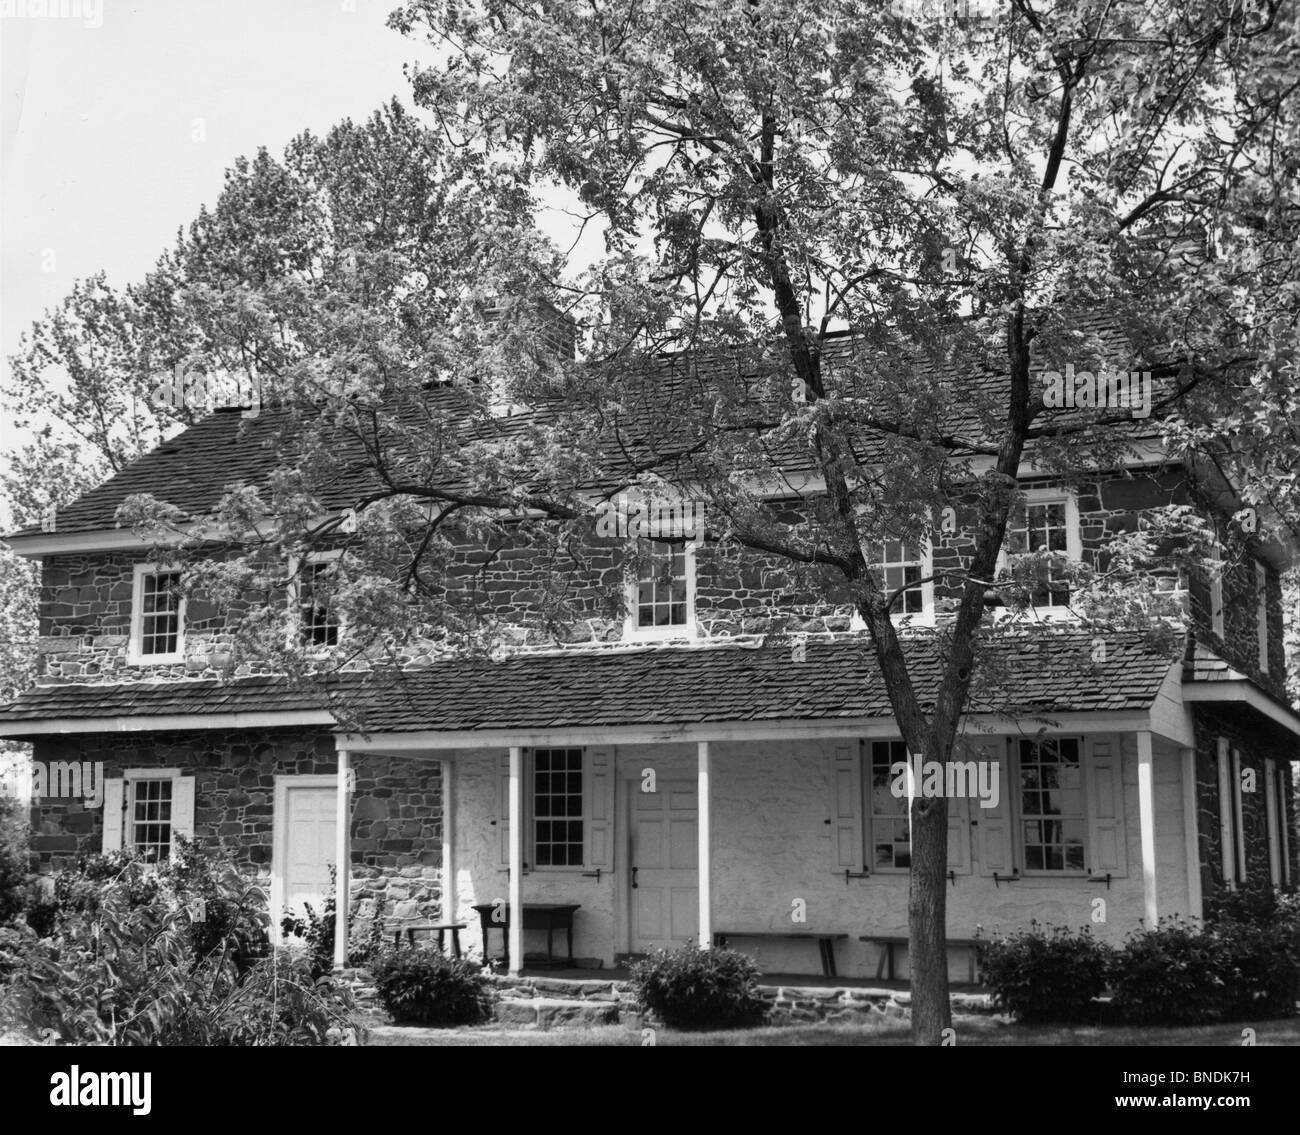 Fassade eines Hauses, Daniel Boone Homestead, Pennsylvania, USA, 1734 Stockbild